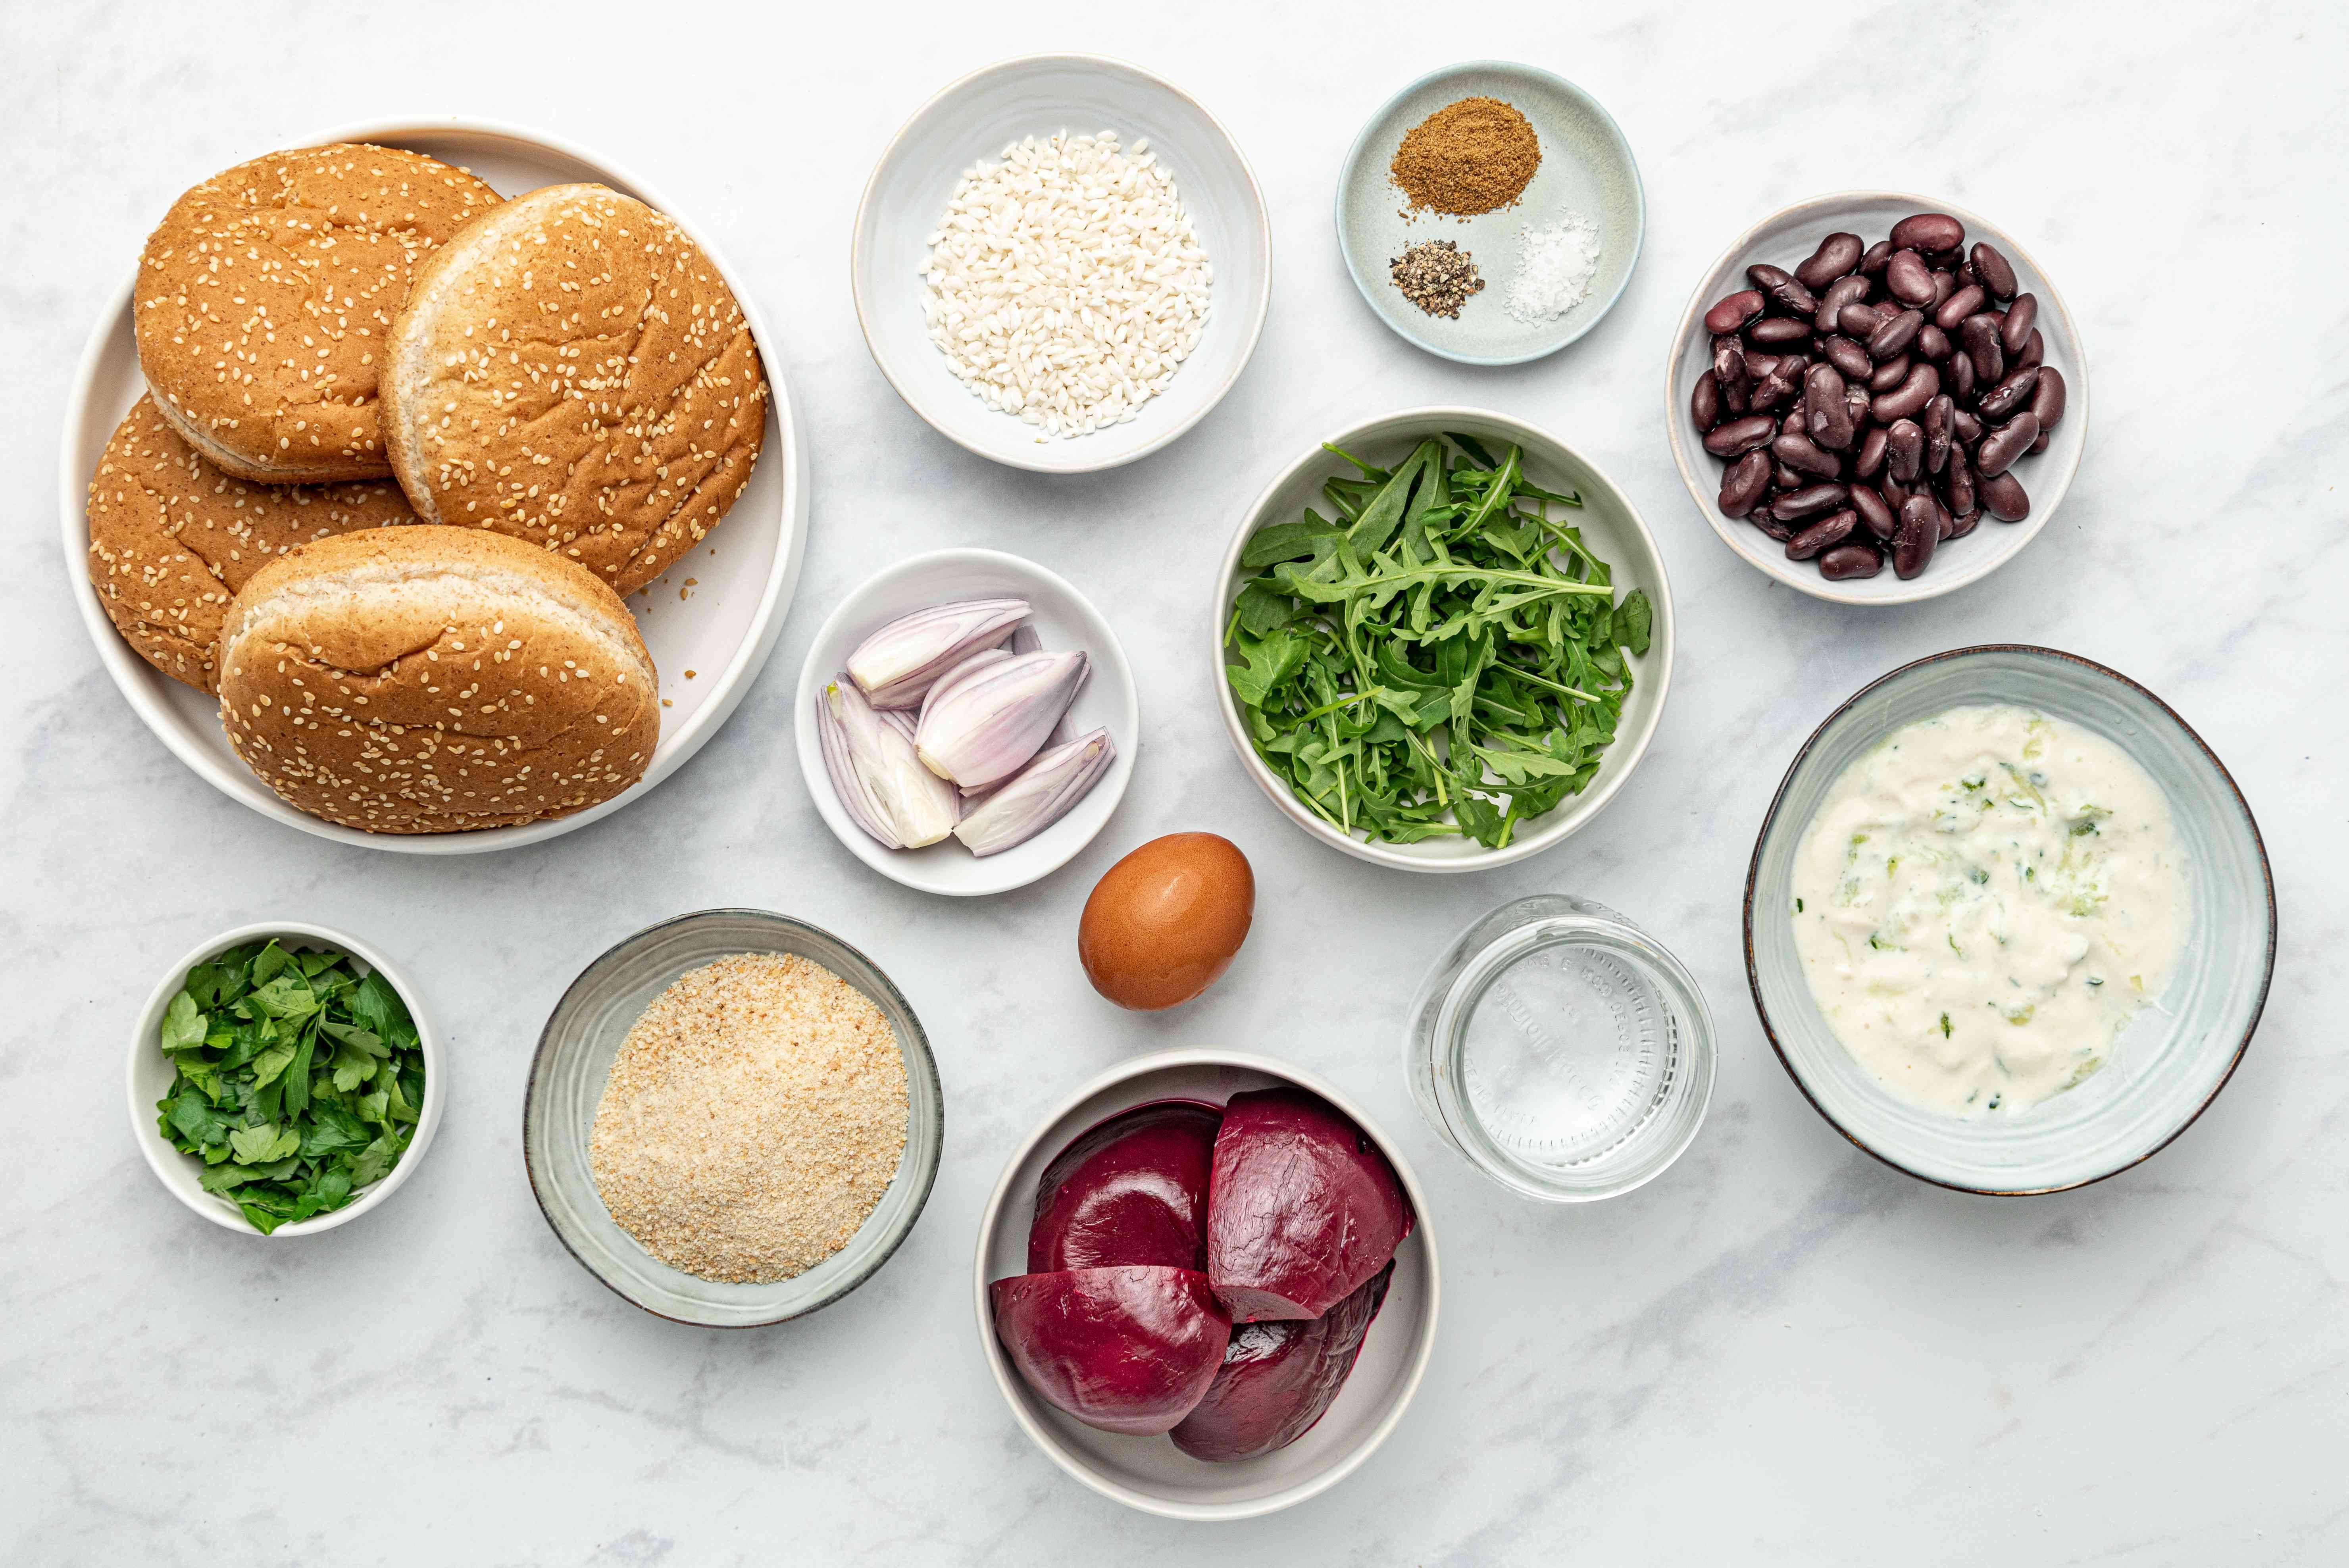 Beet Burger ingredients